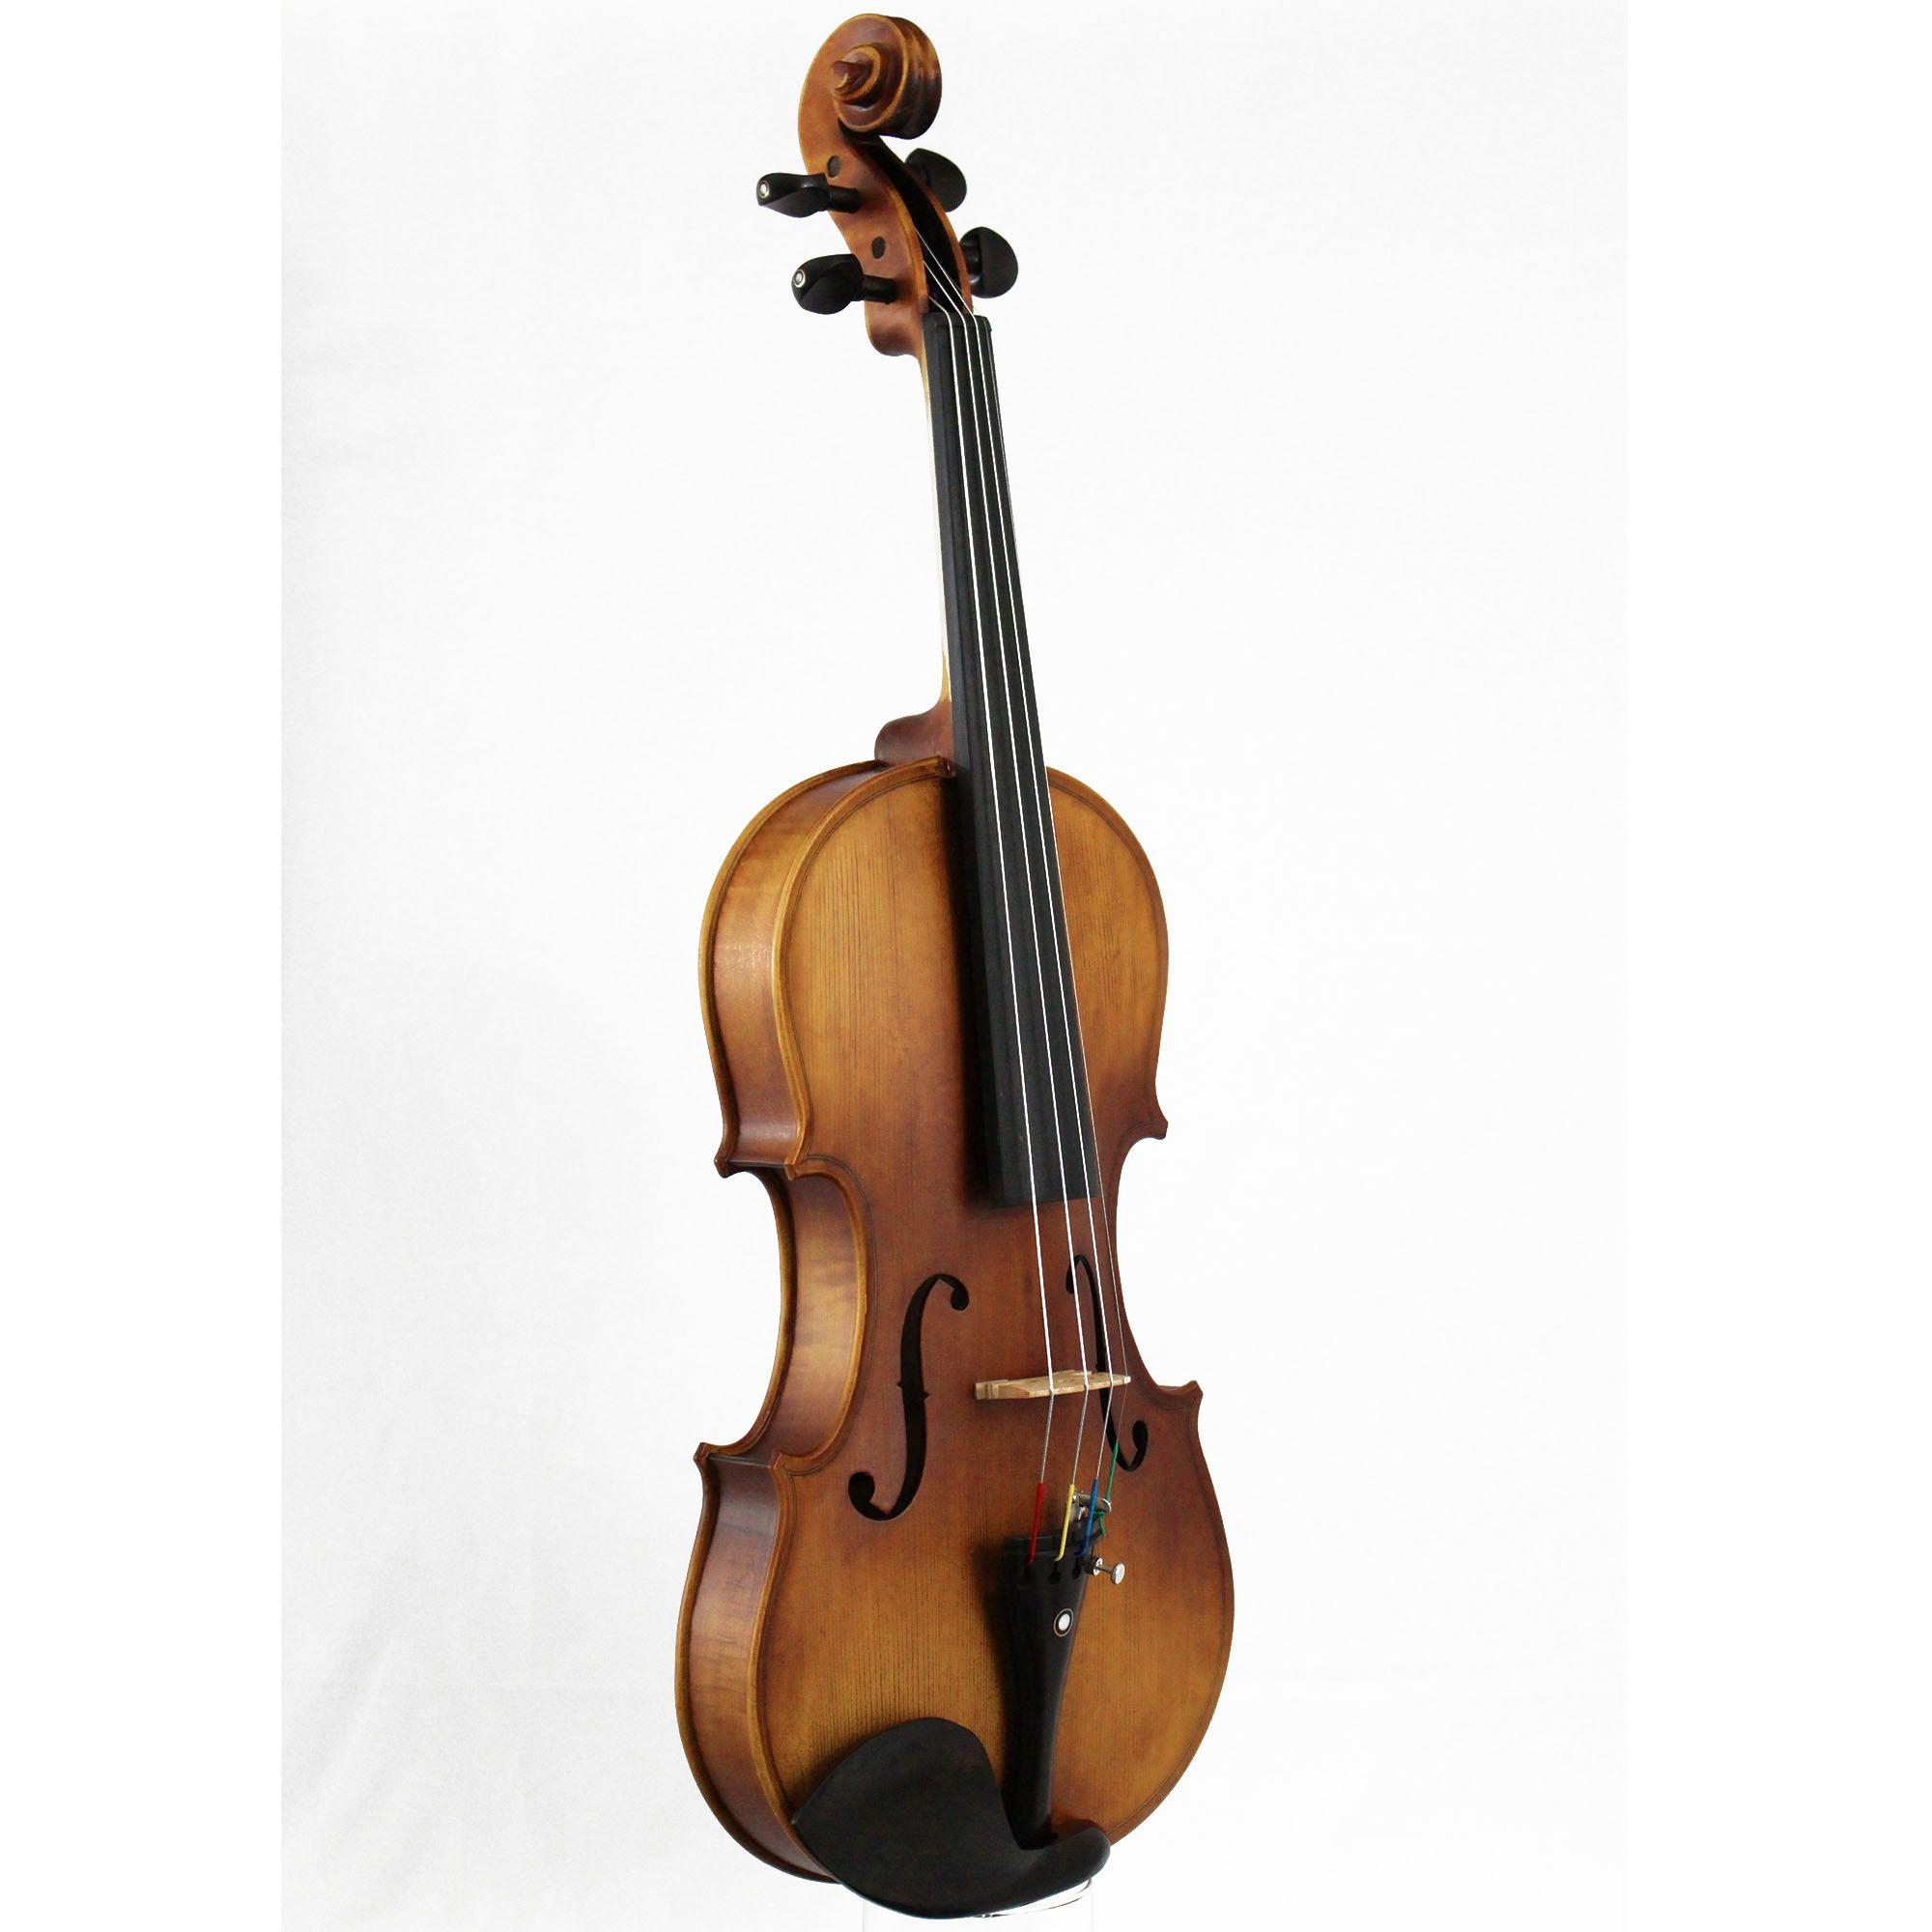 Violino intermediário modelo strad 4/4  Fosco